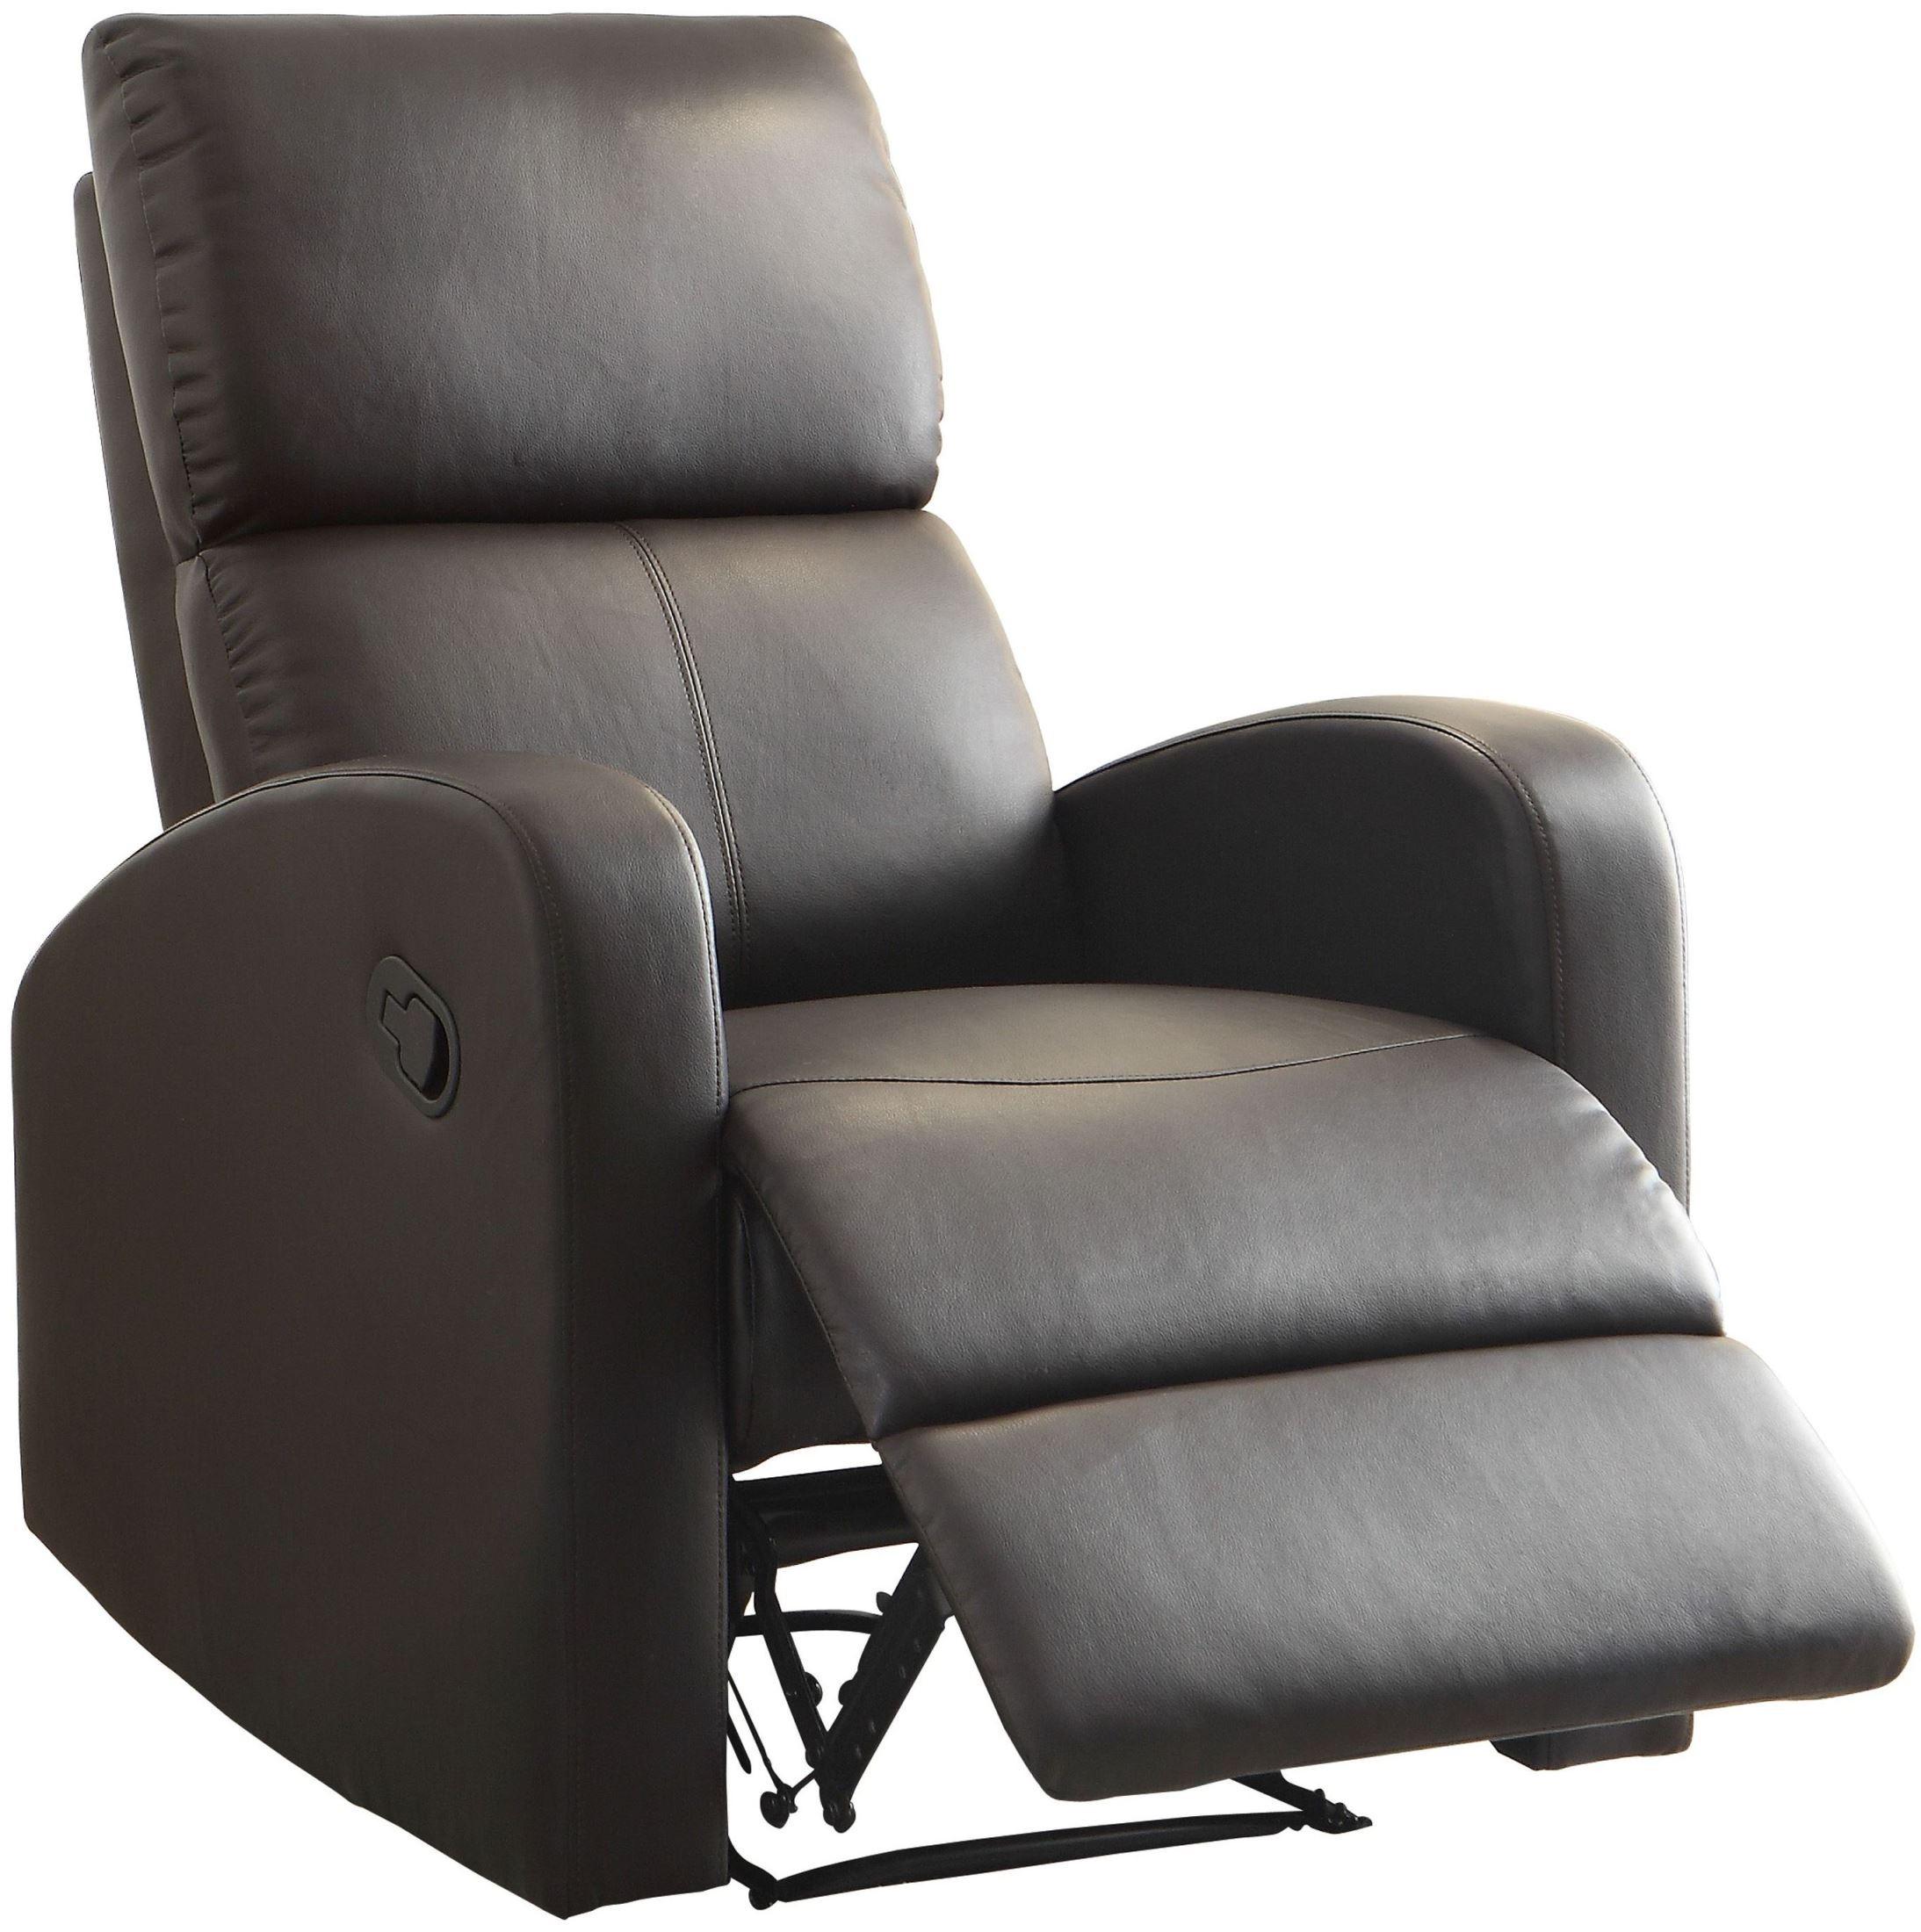 Mendon Dark Brown Reclining Chair from Homelegance 8404DB 1